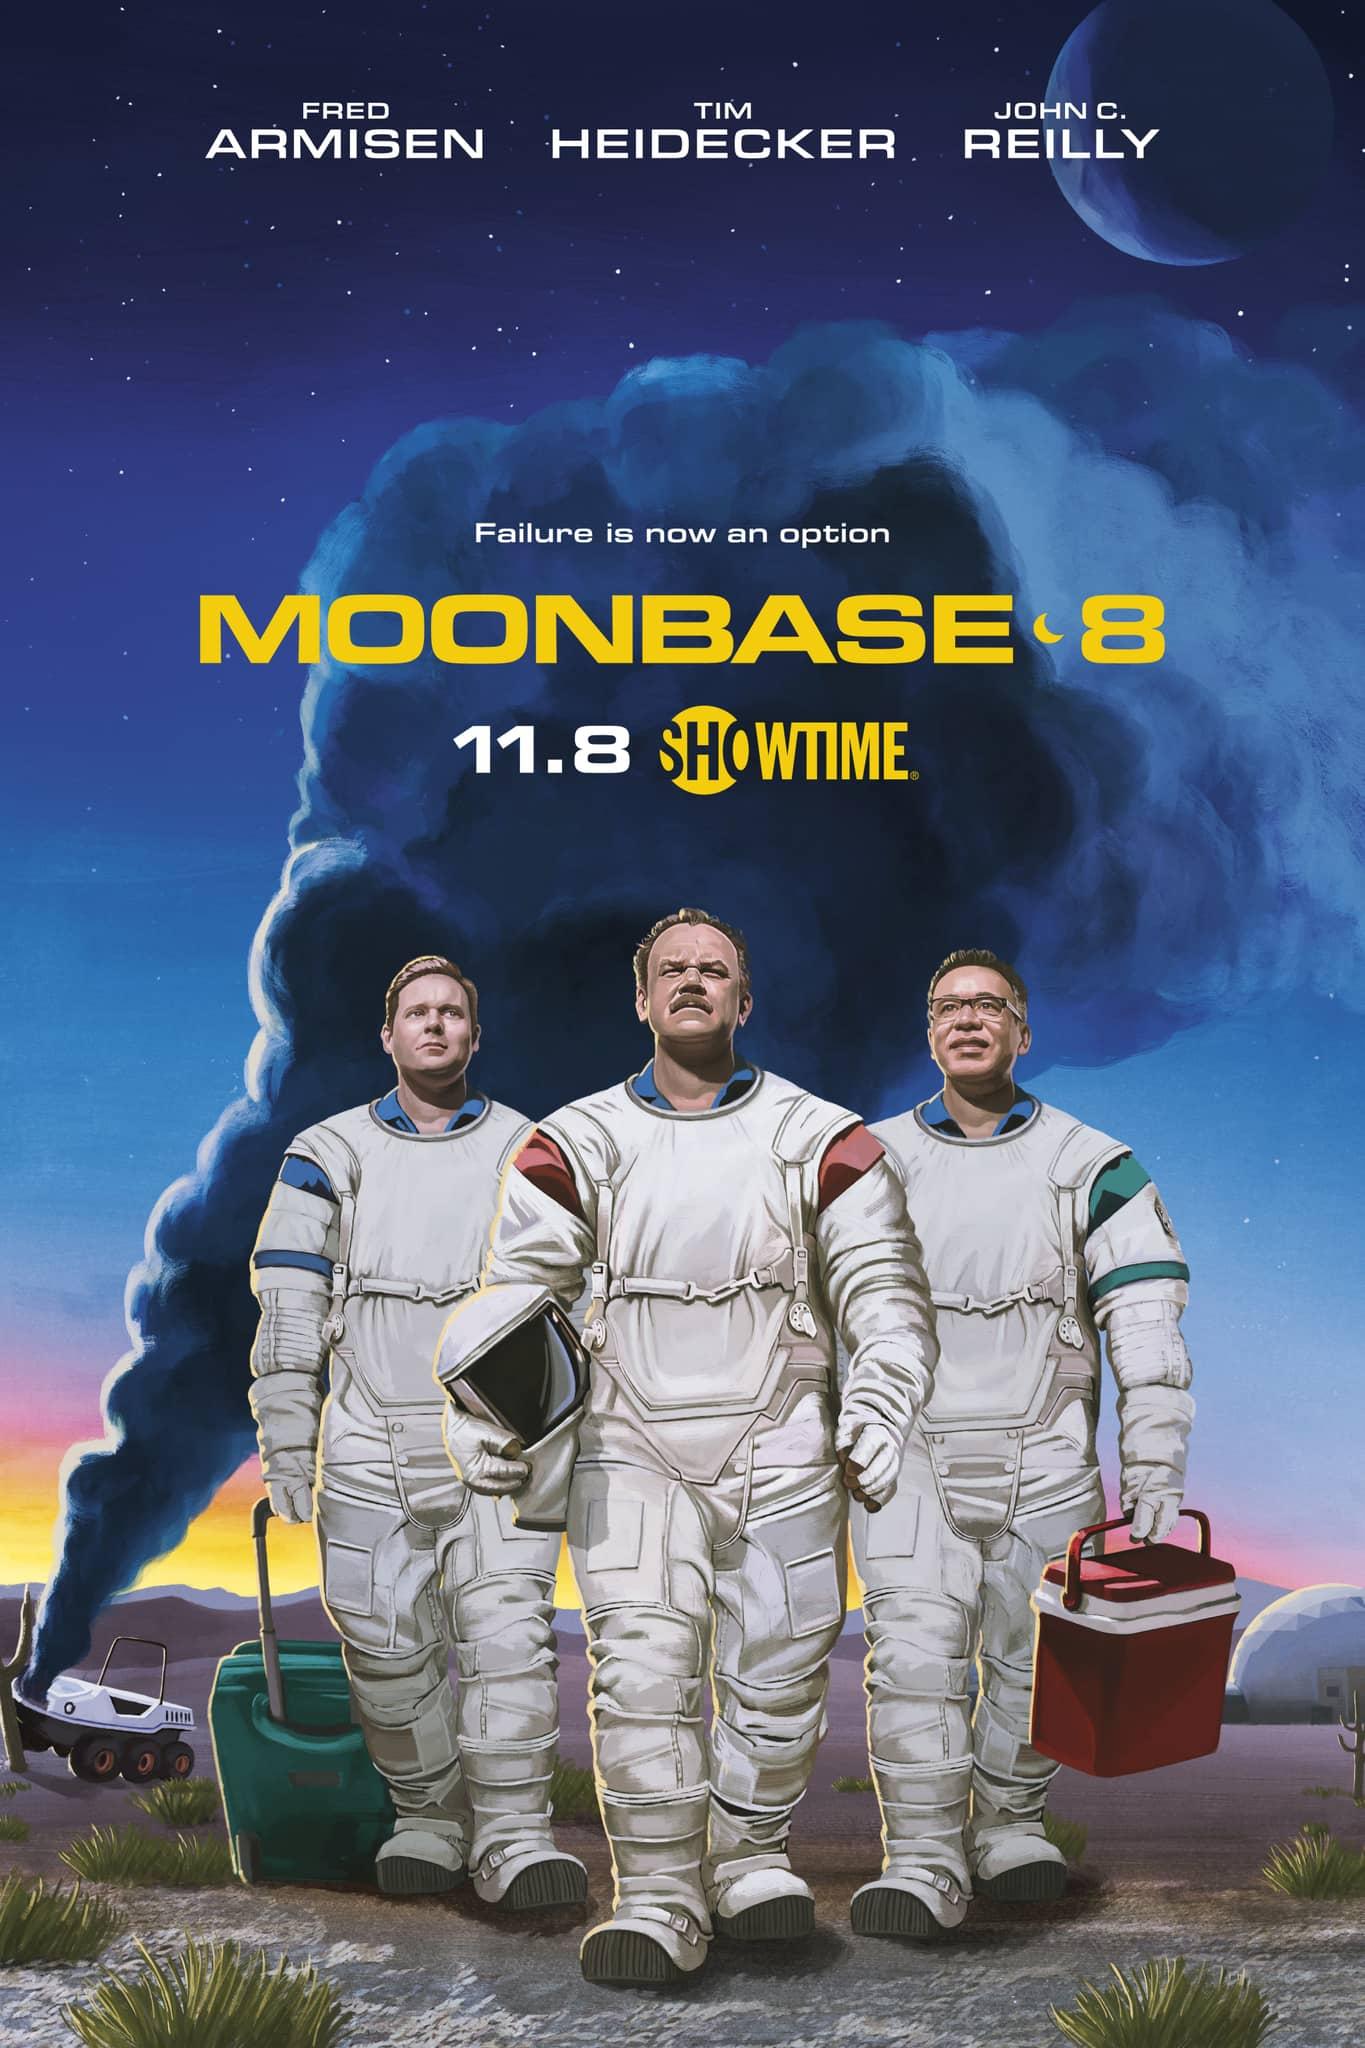 moonbase 8 Poster Key Art Showtime